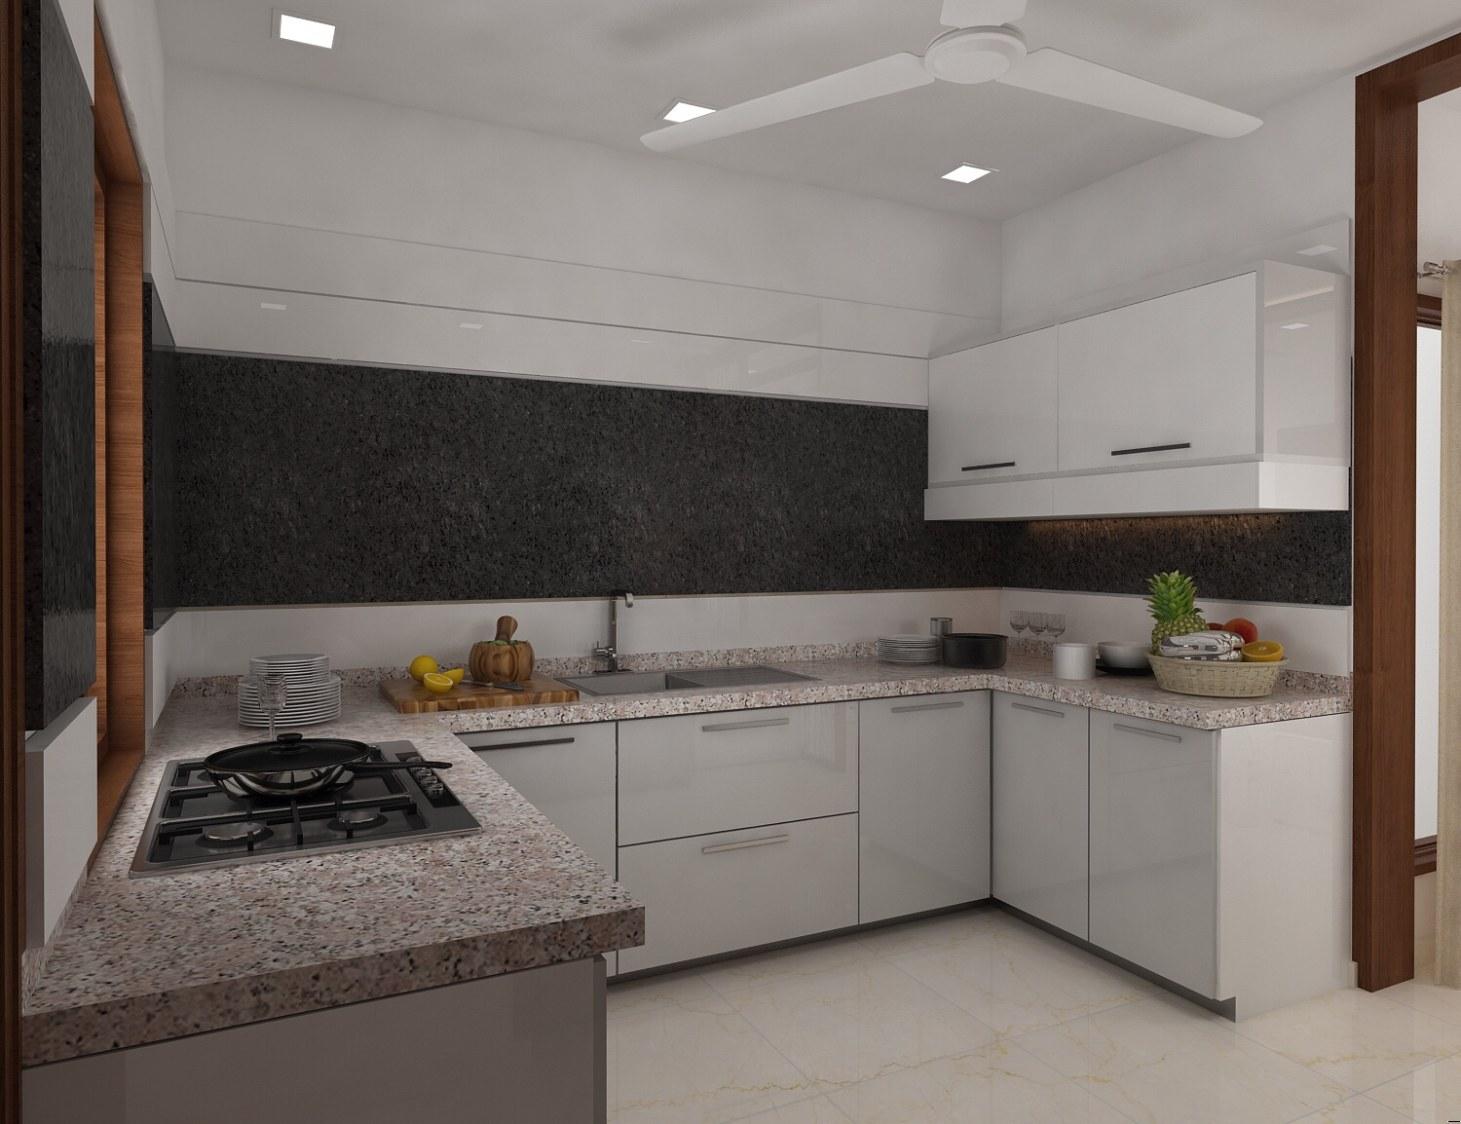 Modular kitchen by setu.patel Modular-kitchen | Interior Design Photos & Ideas